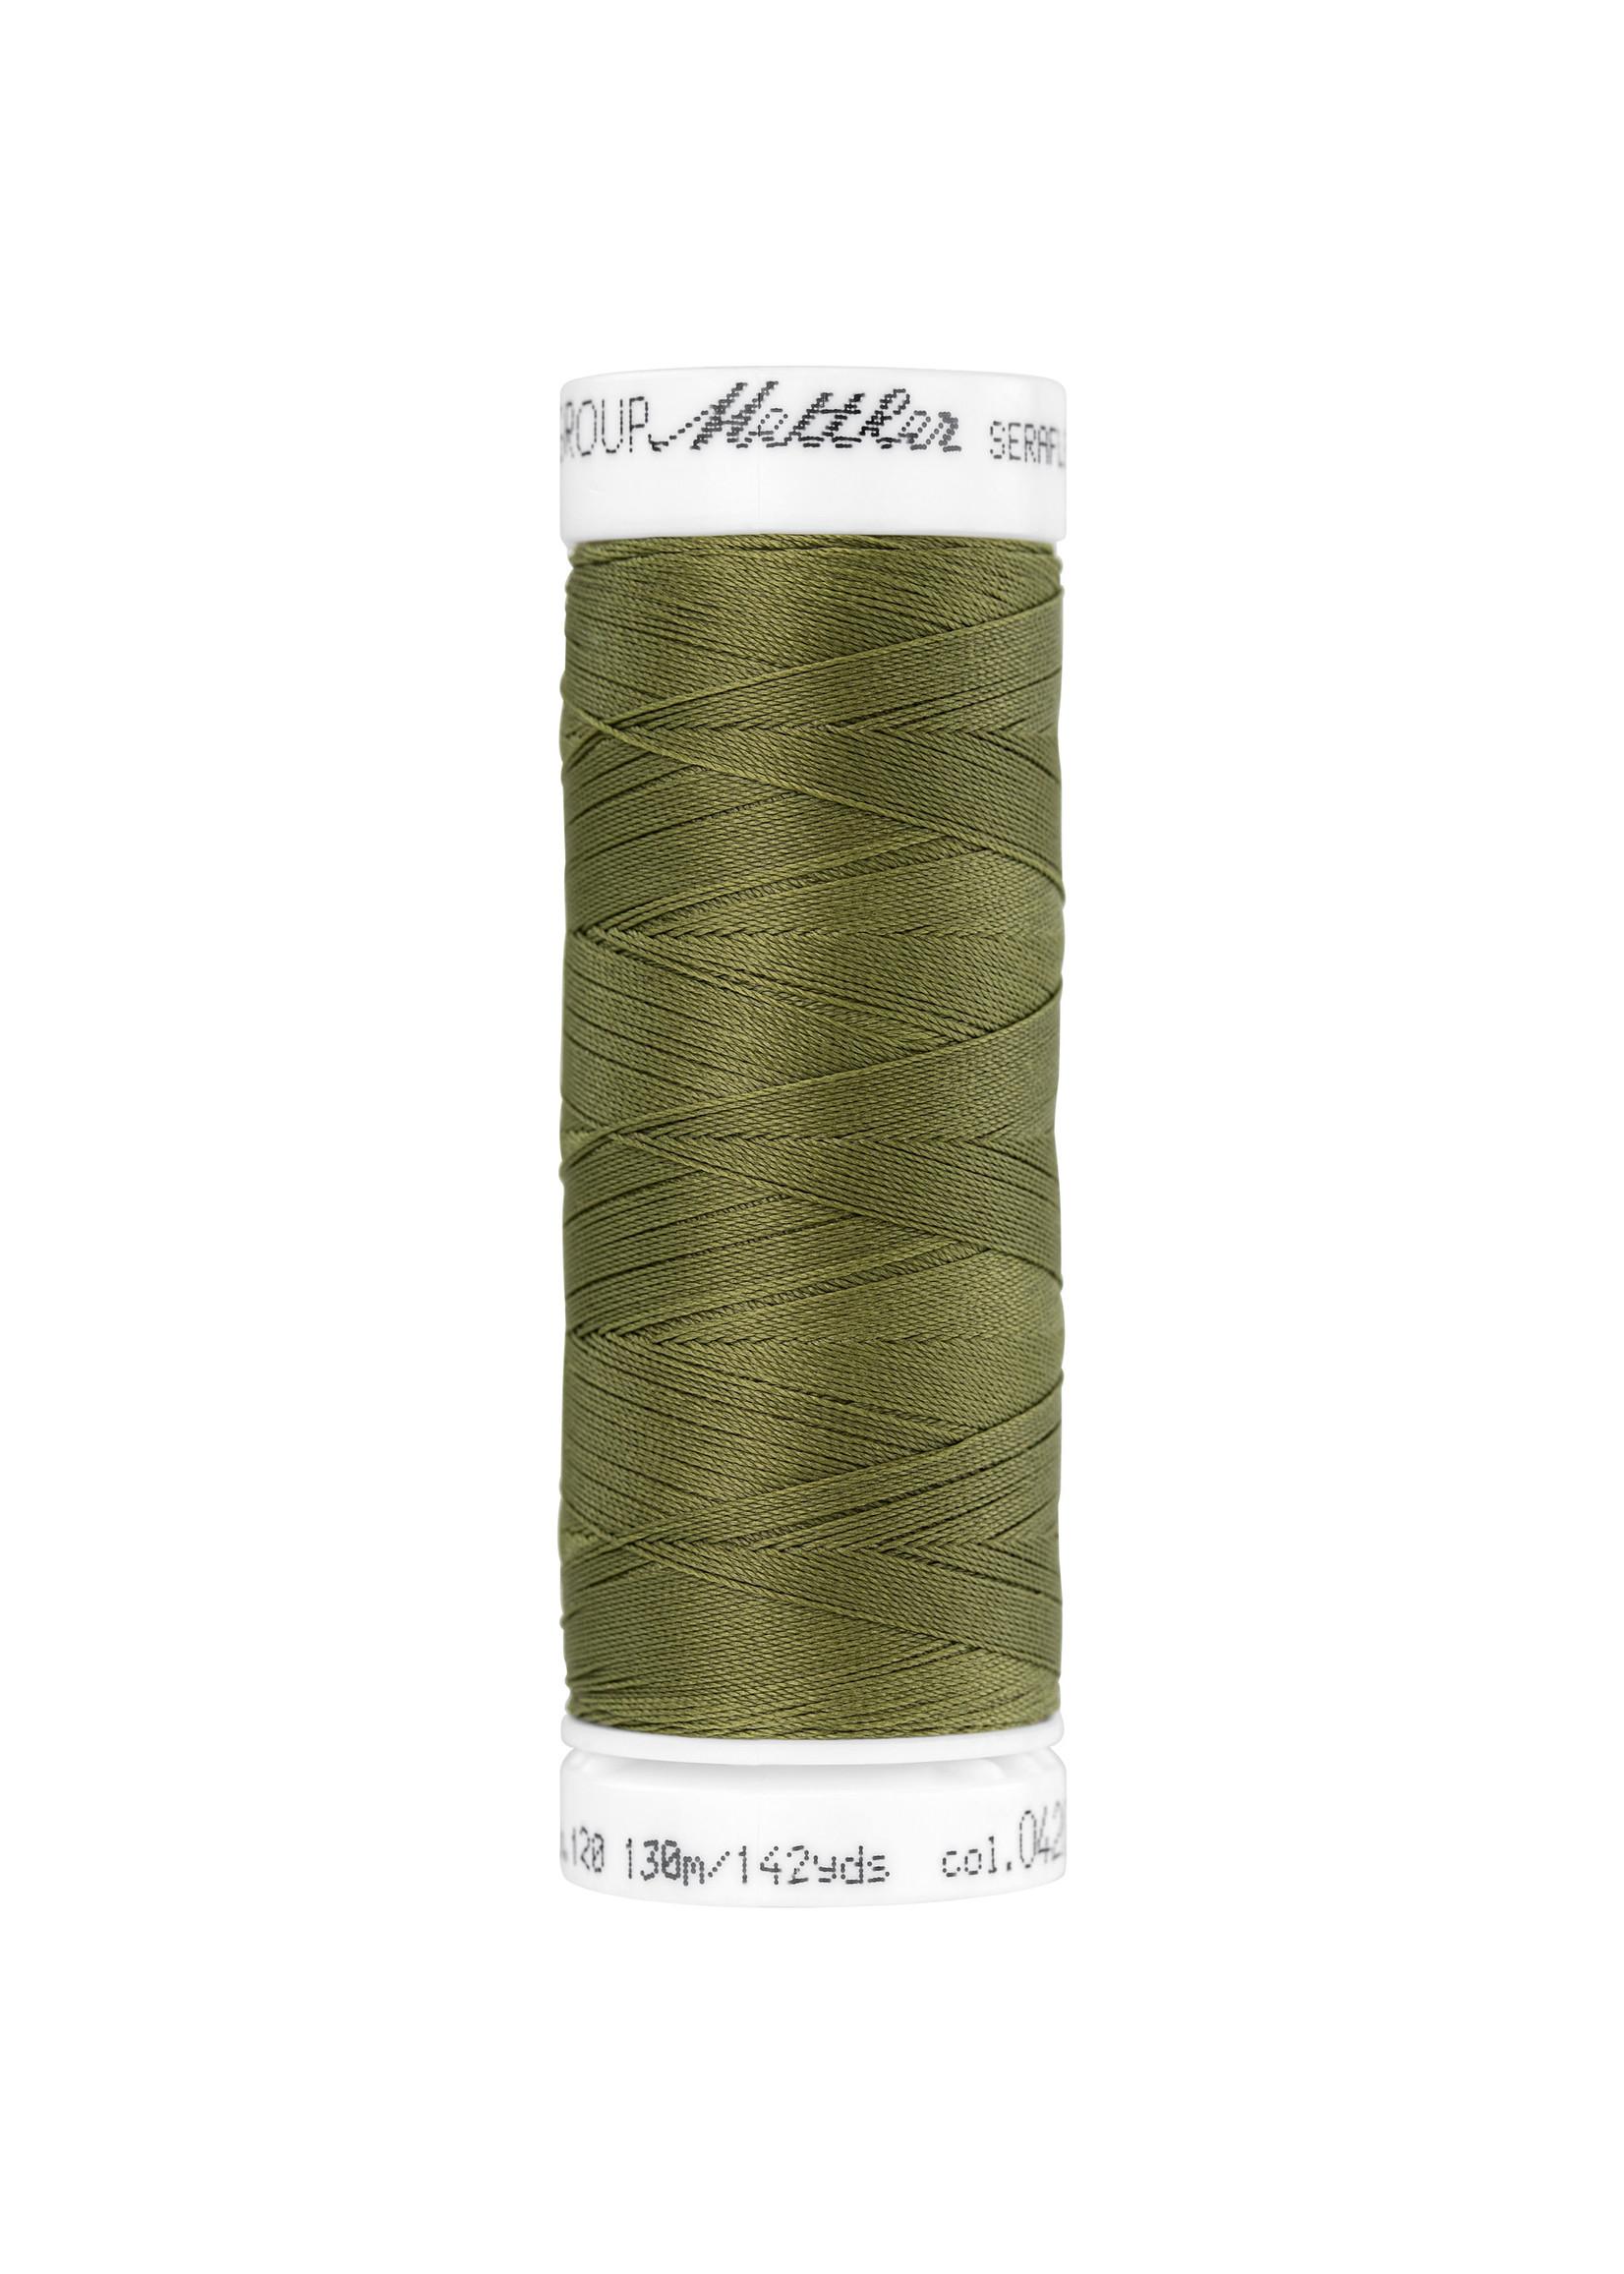 Mettler Seraflex 0420